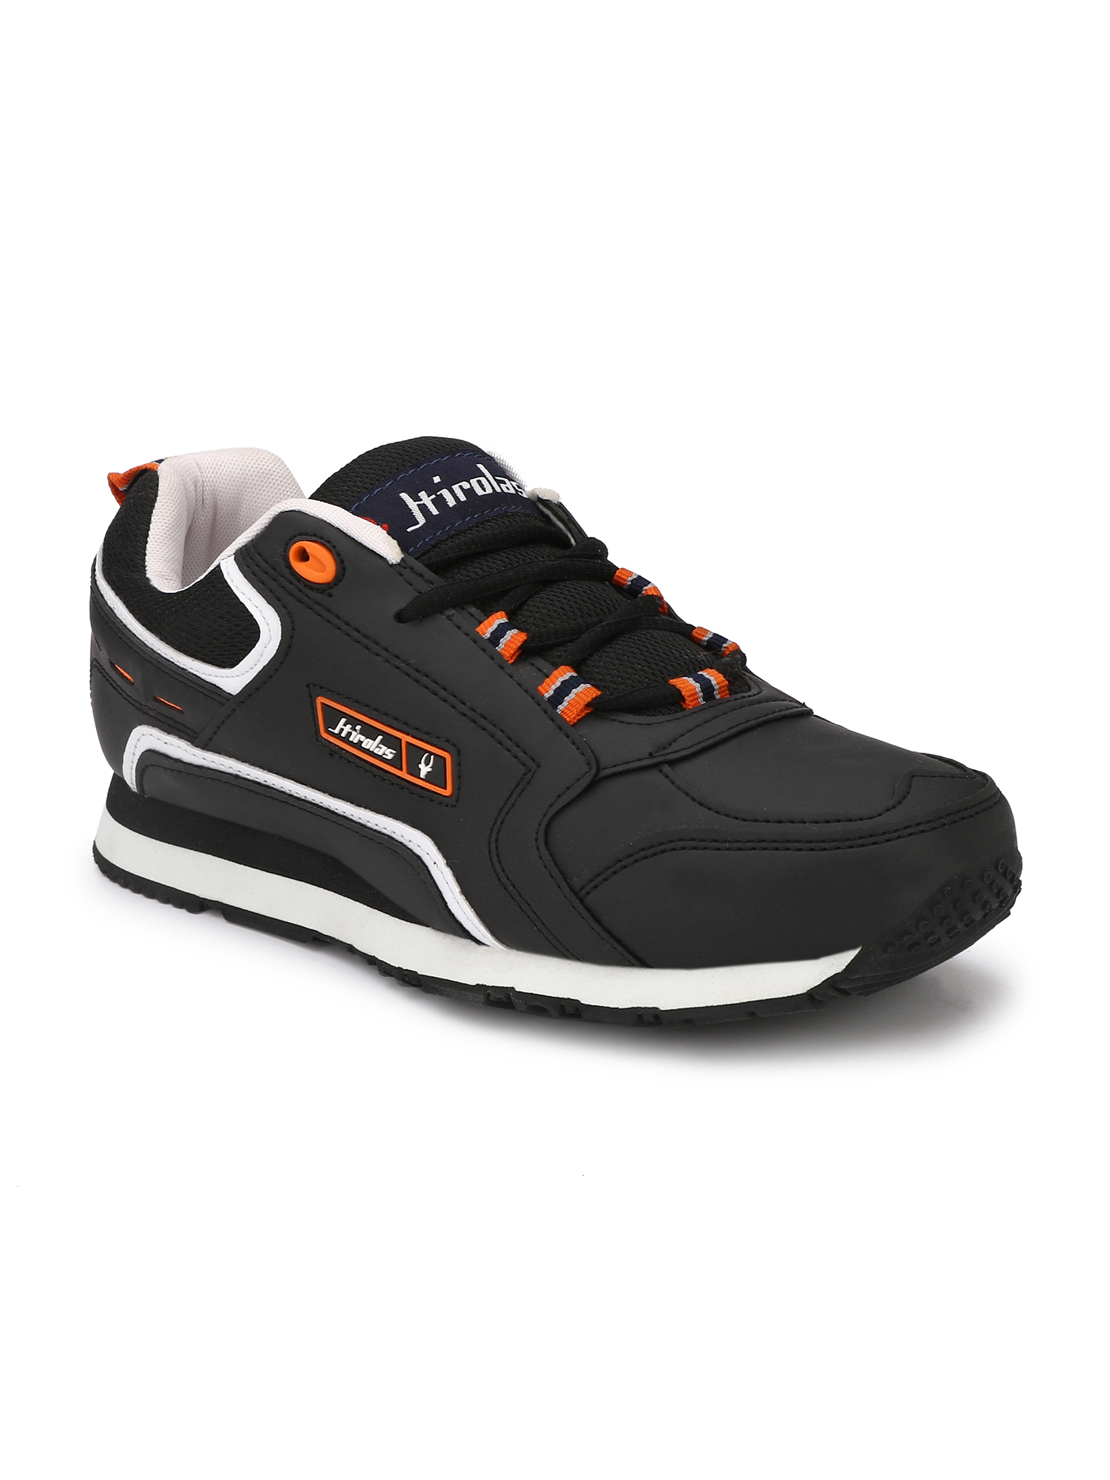 Hirolas   Hirolas Men's Multisport Sneaker Shoes- Black